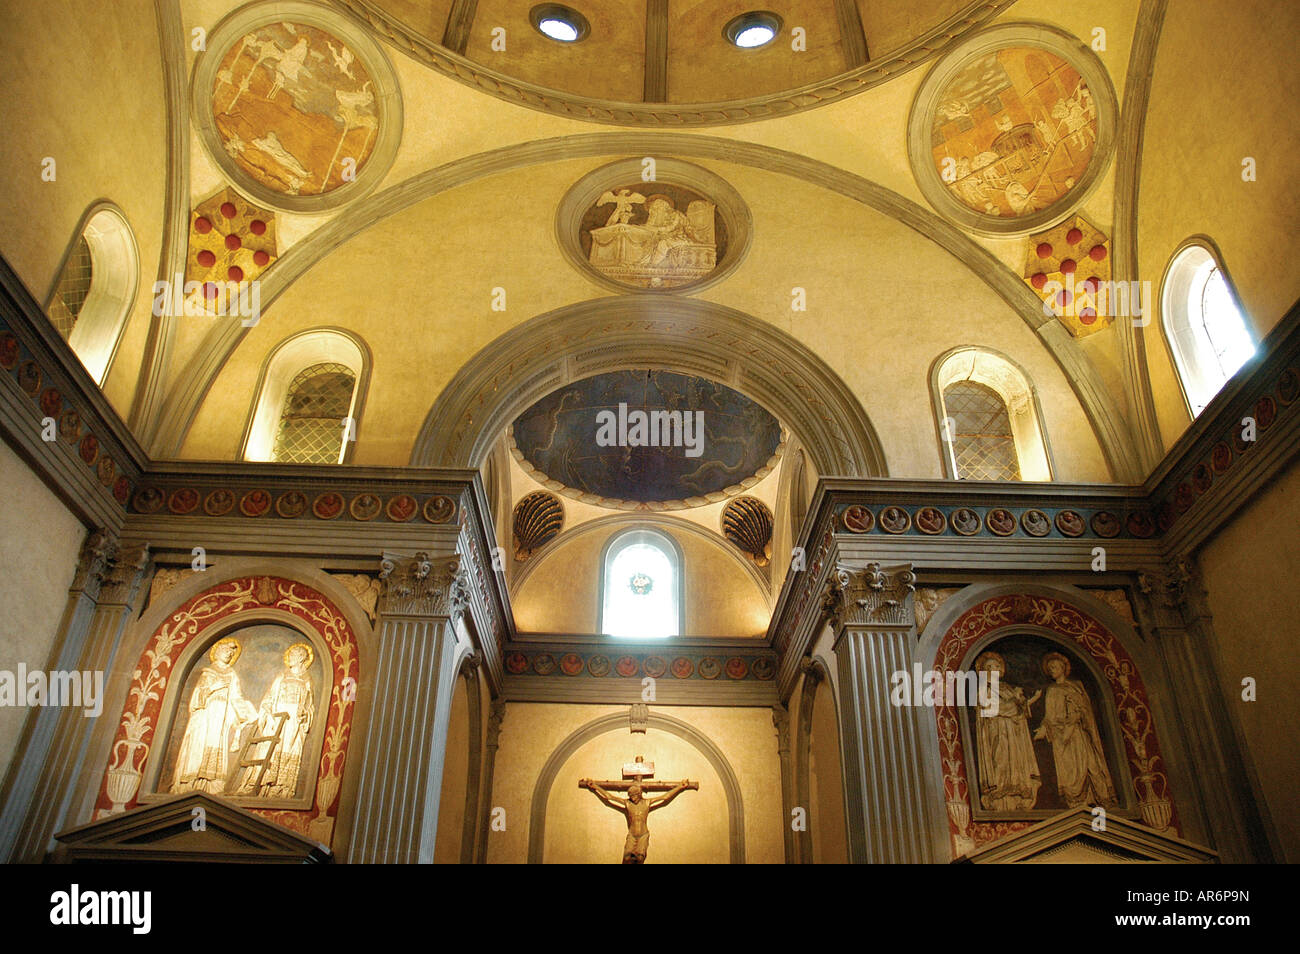 Sagrestia Vecchia 1421 1426 designed by Brunelleschi San Lorenzo church  Florence Toscana Italy